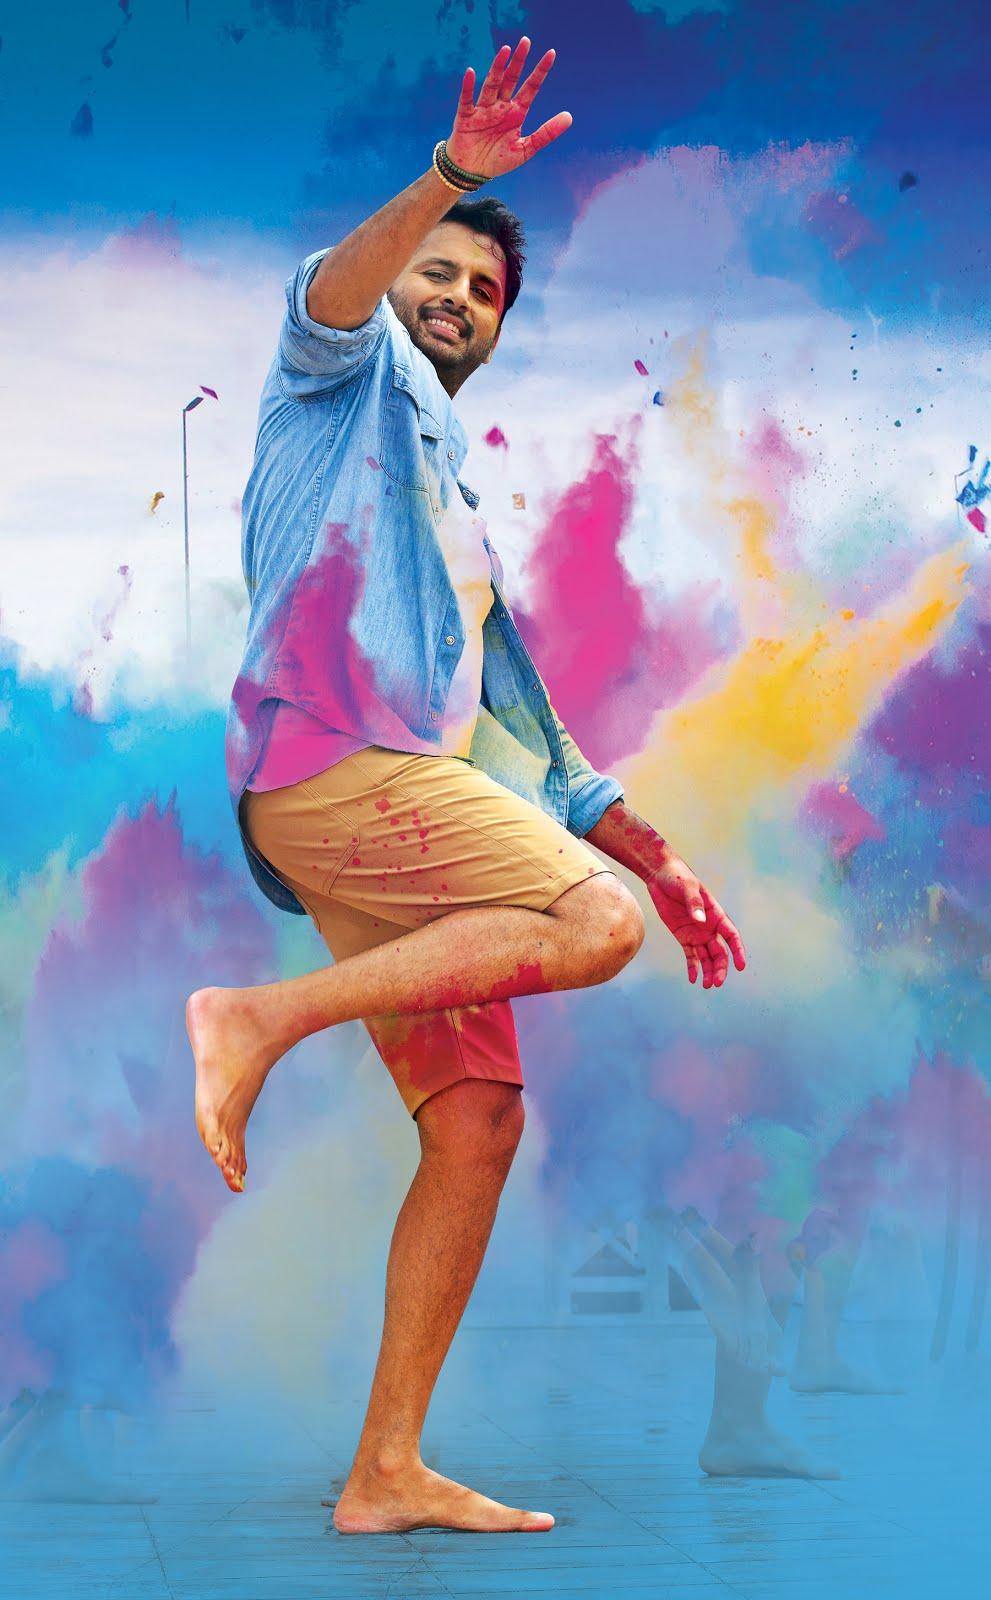 Chal Mohan Ranga 2018 Dual Audio UNCUT [Hindi + Telugu] 720p HDRip Download